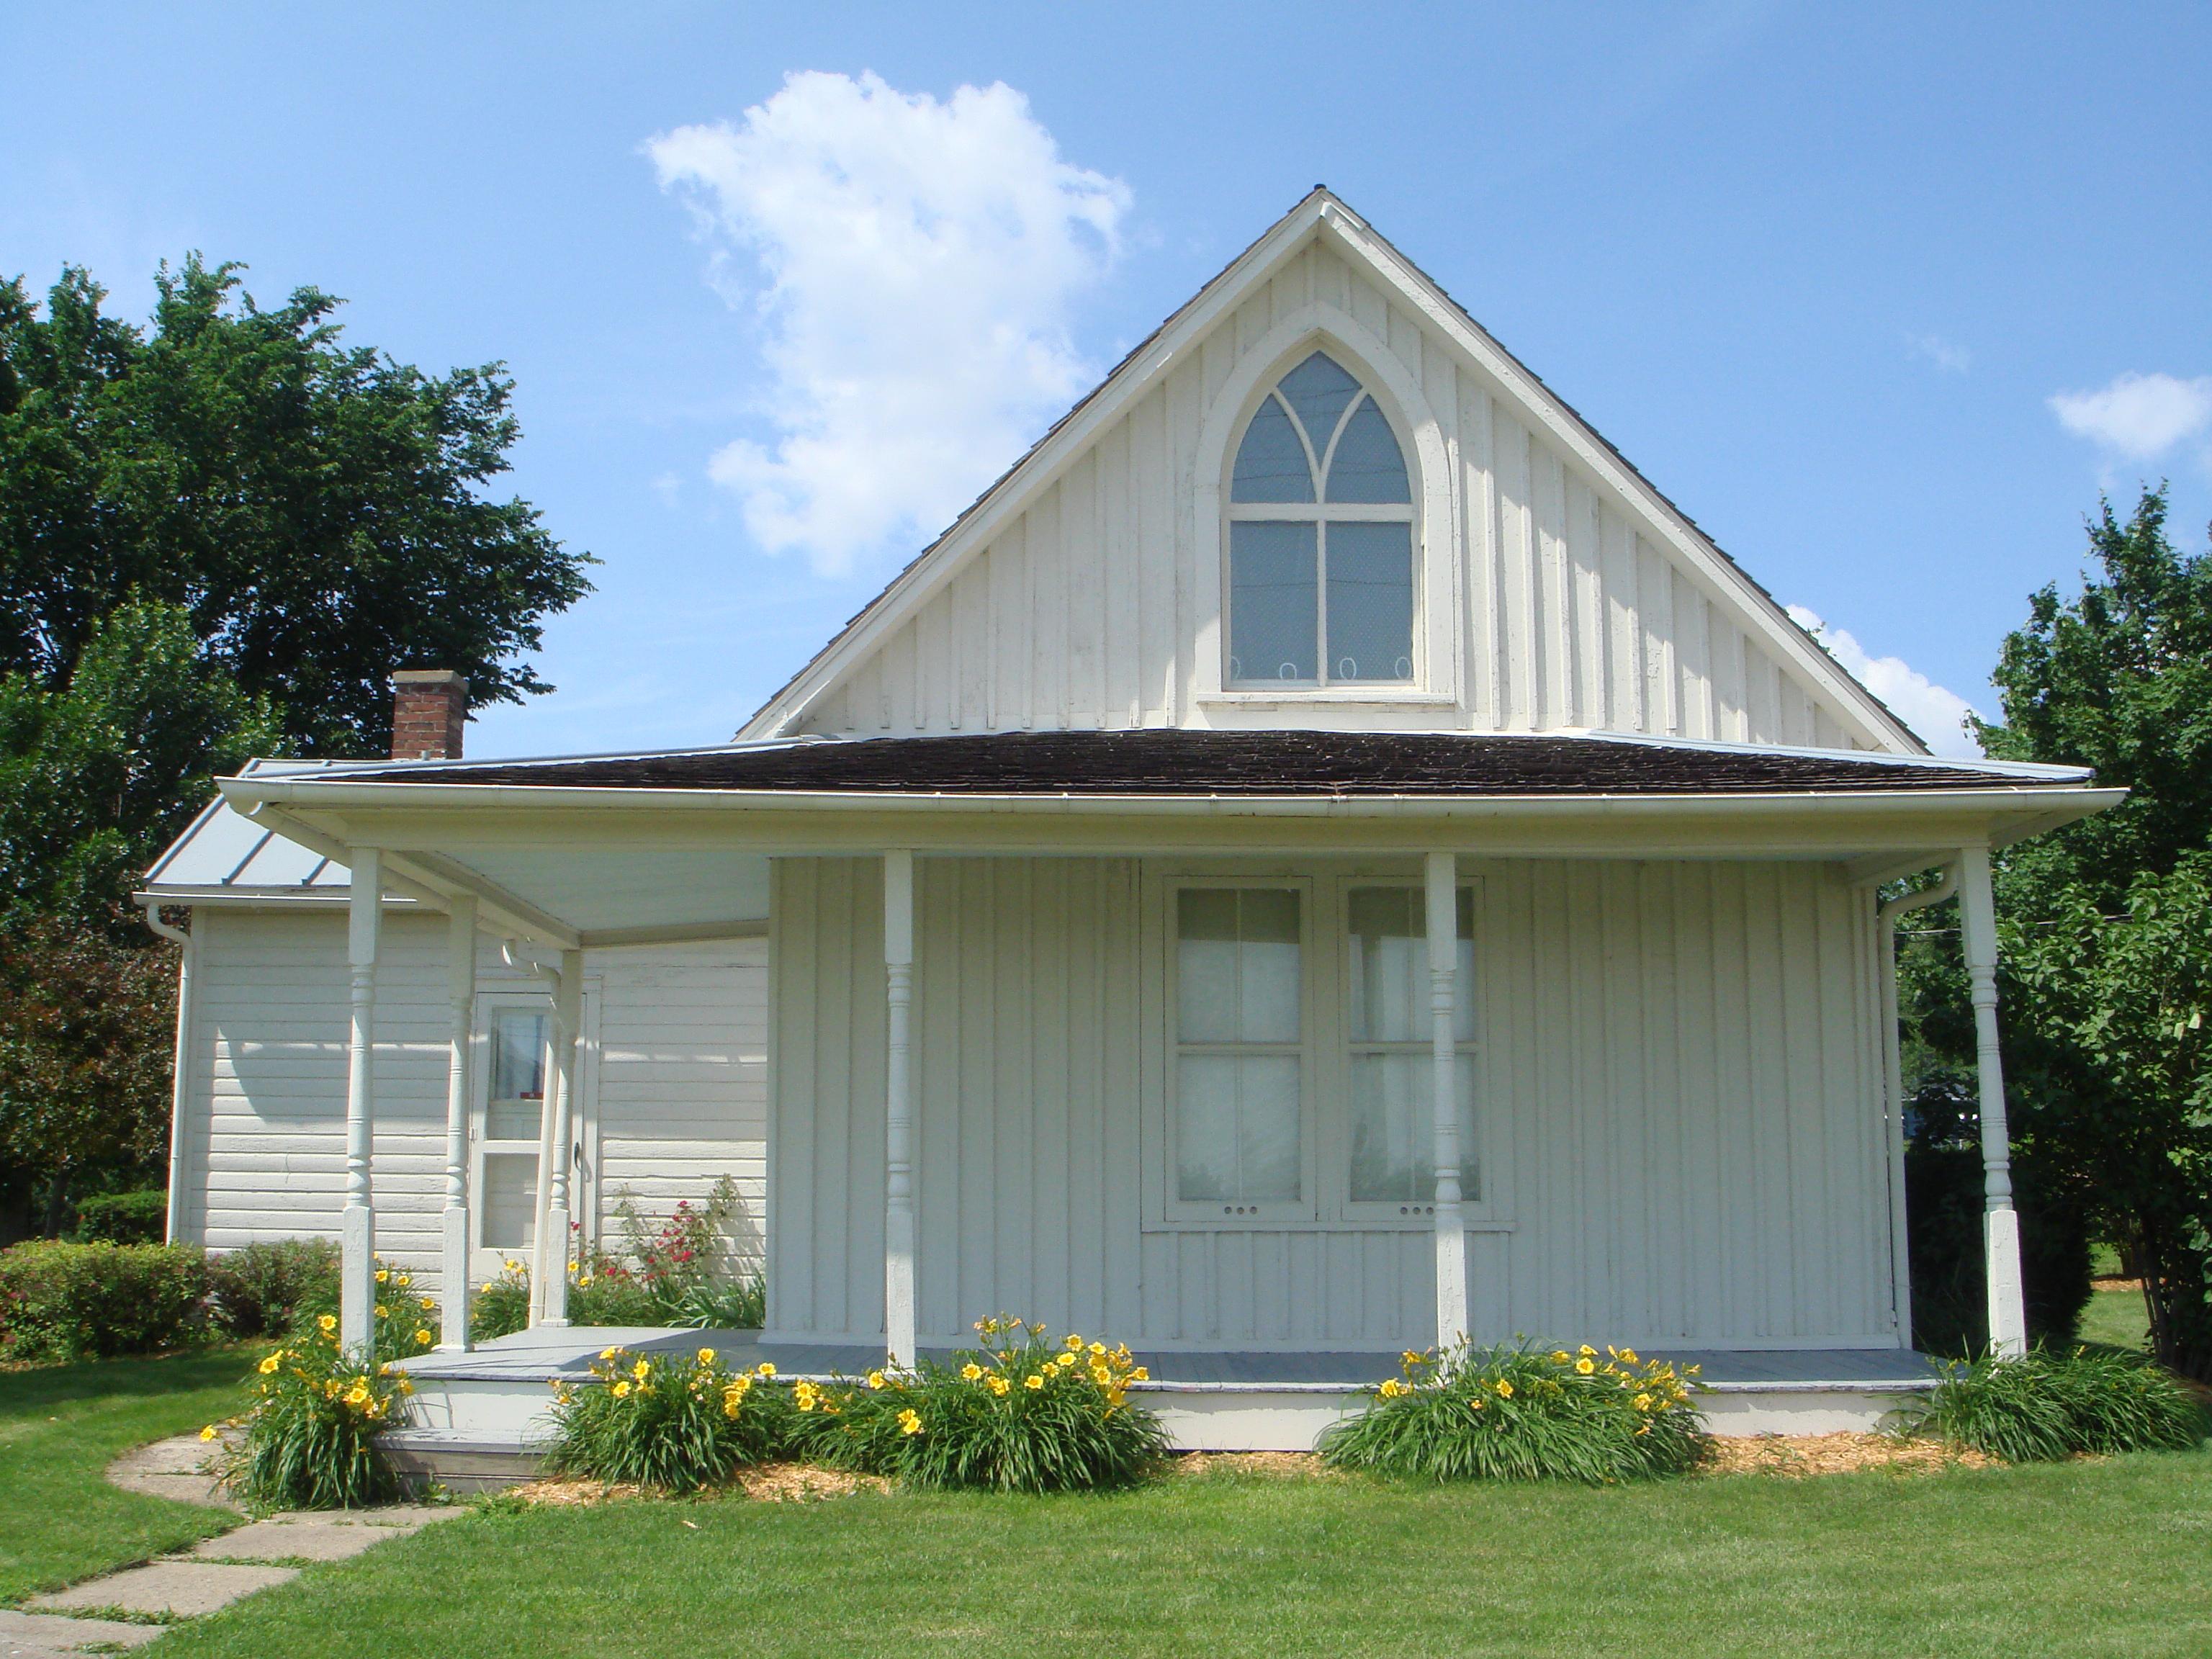 File:2007-06-04-Gothic House.jpg - Wikipedia, the free encyclopedia